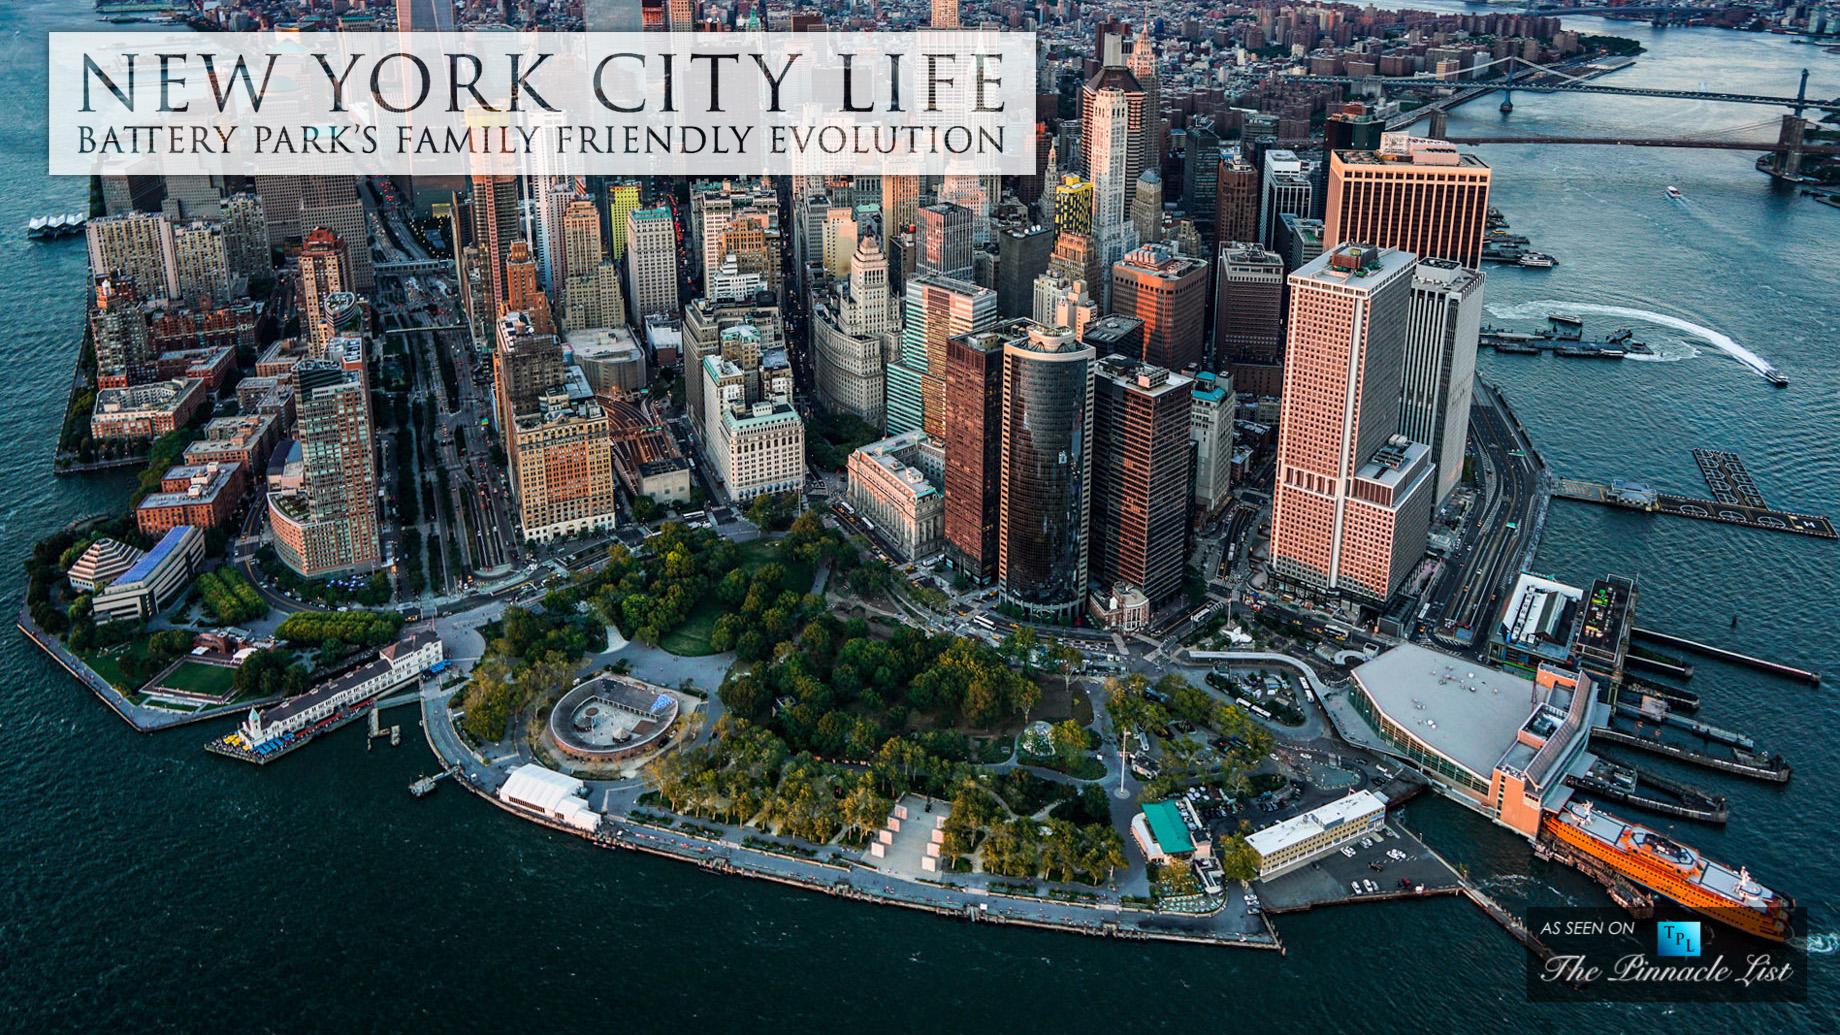 New York City Life – Battery Park's Family Friendly Evolution